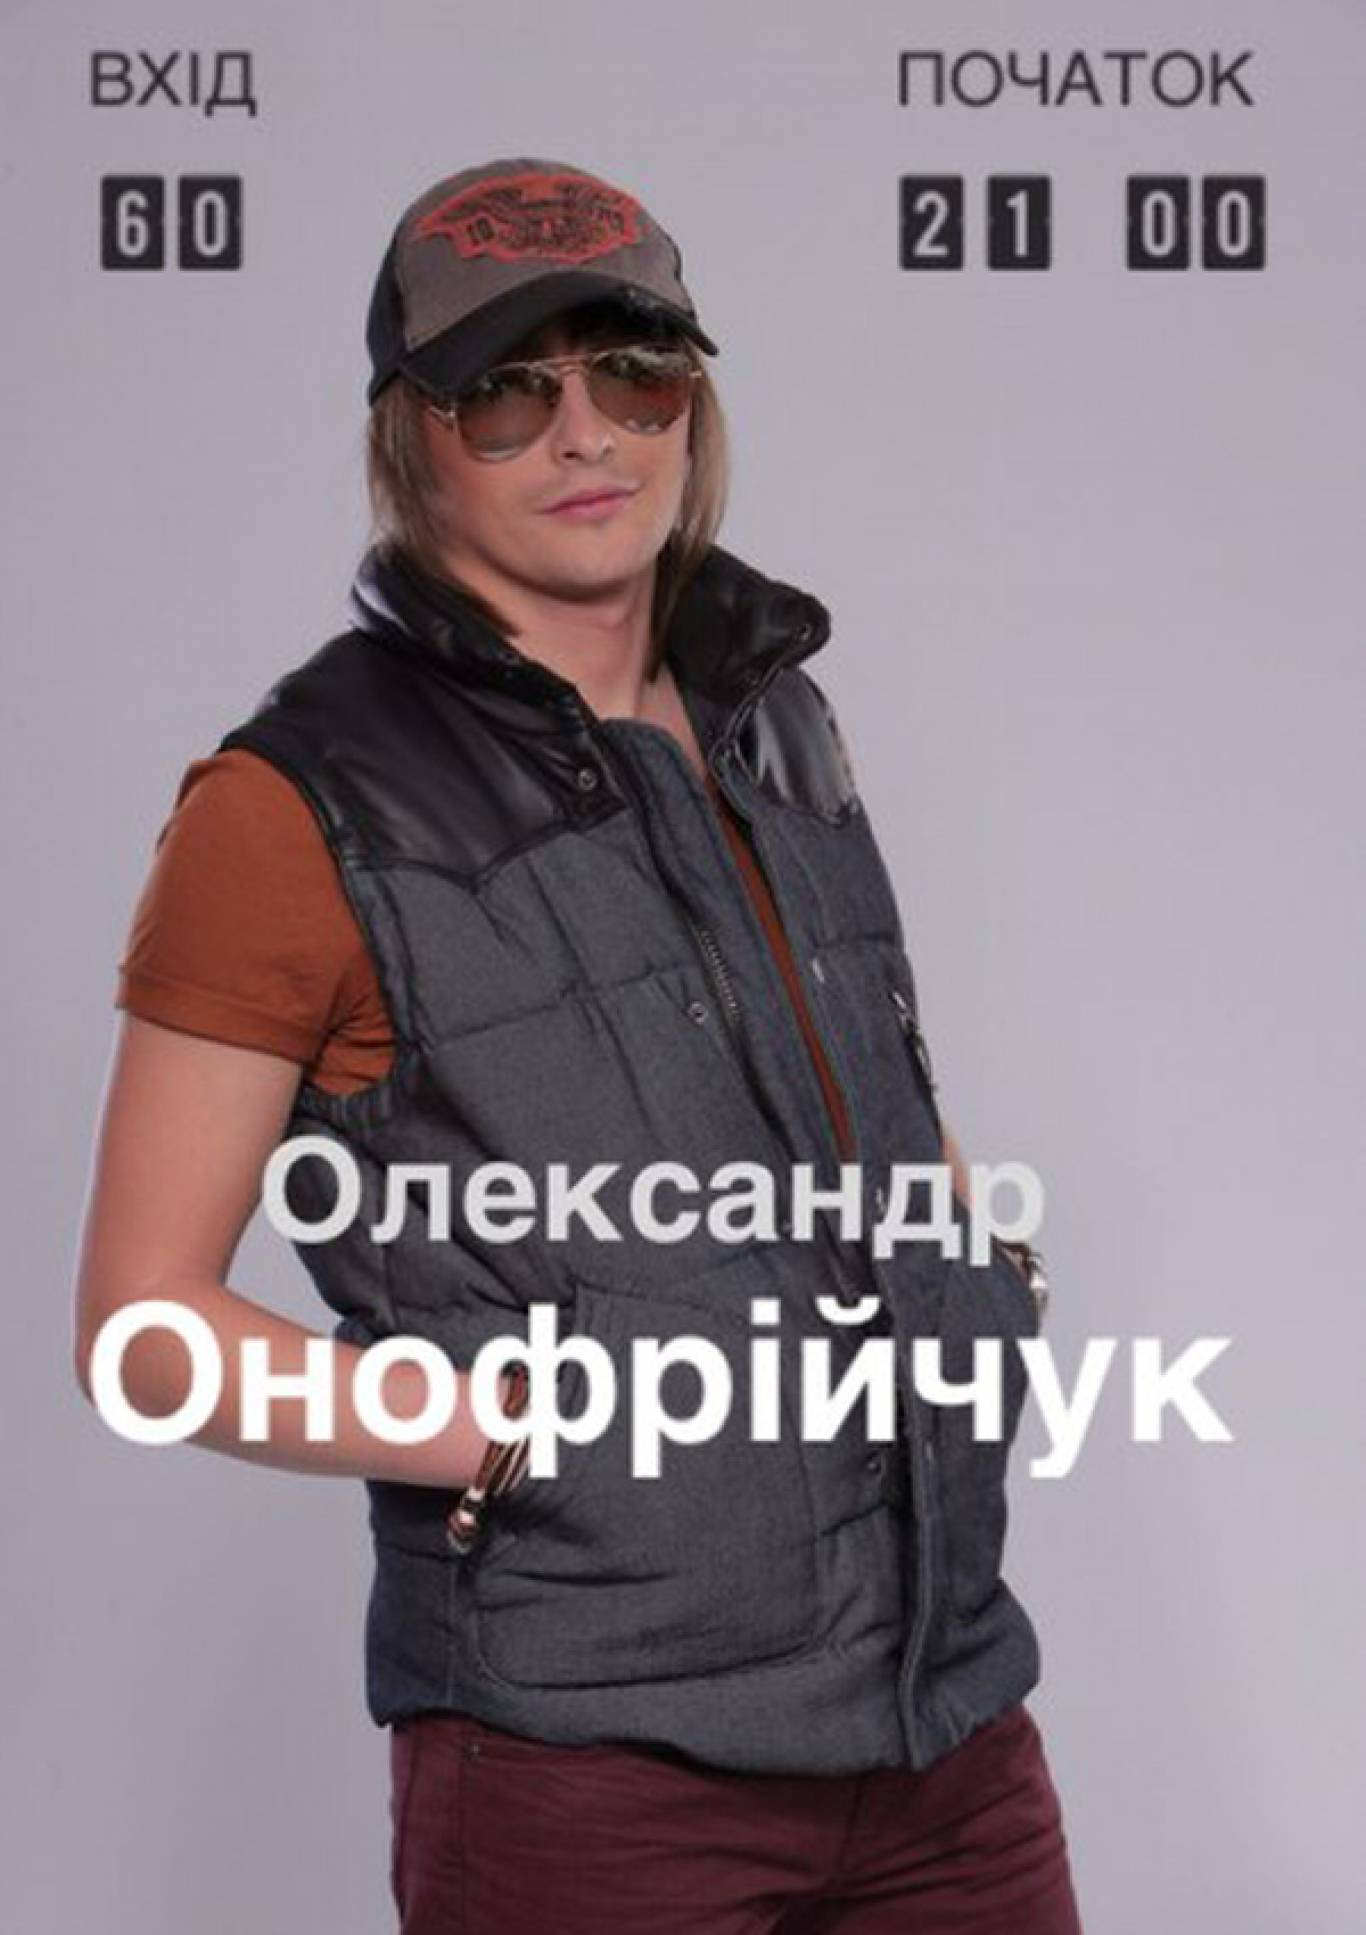 Олександр Онофрійчук з концертом у арт-пабі